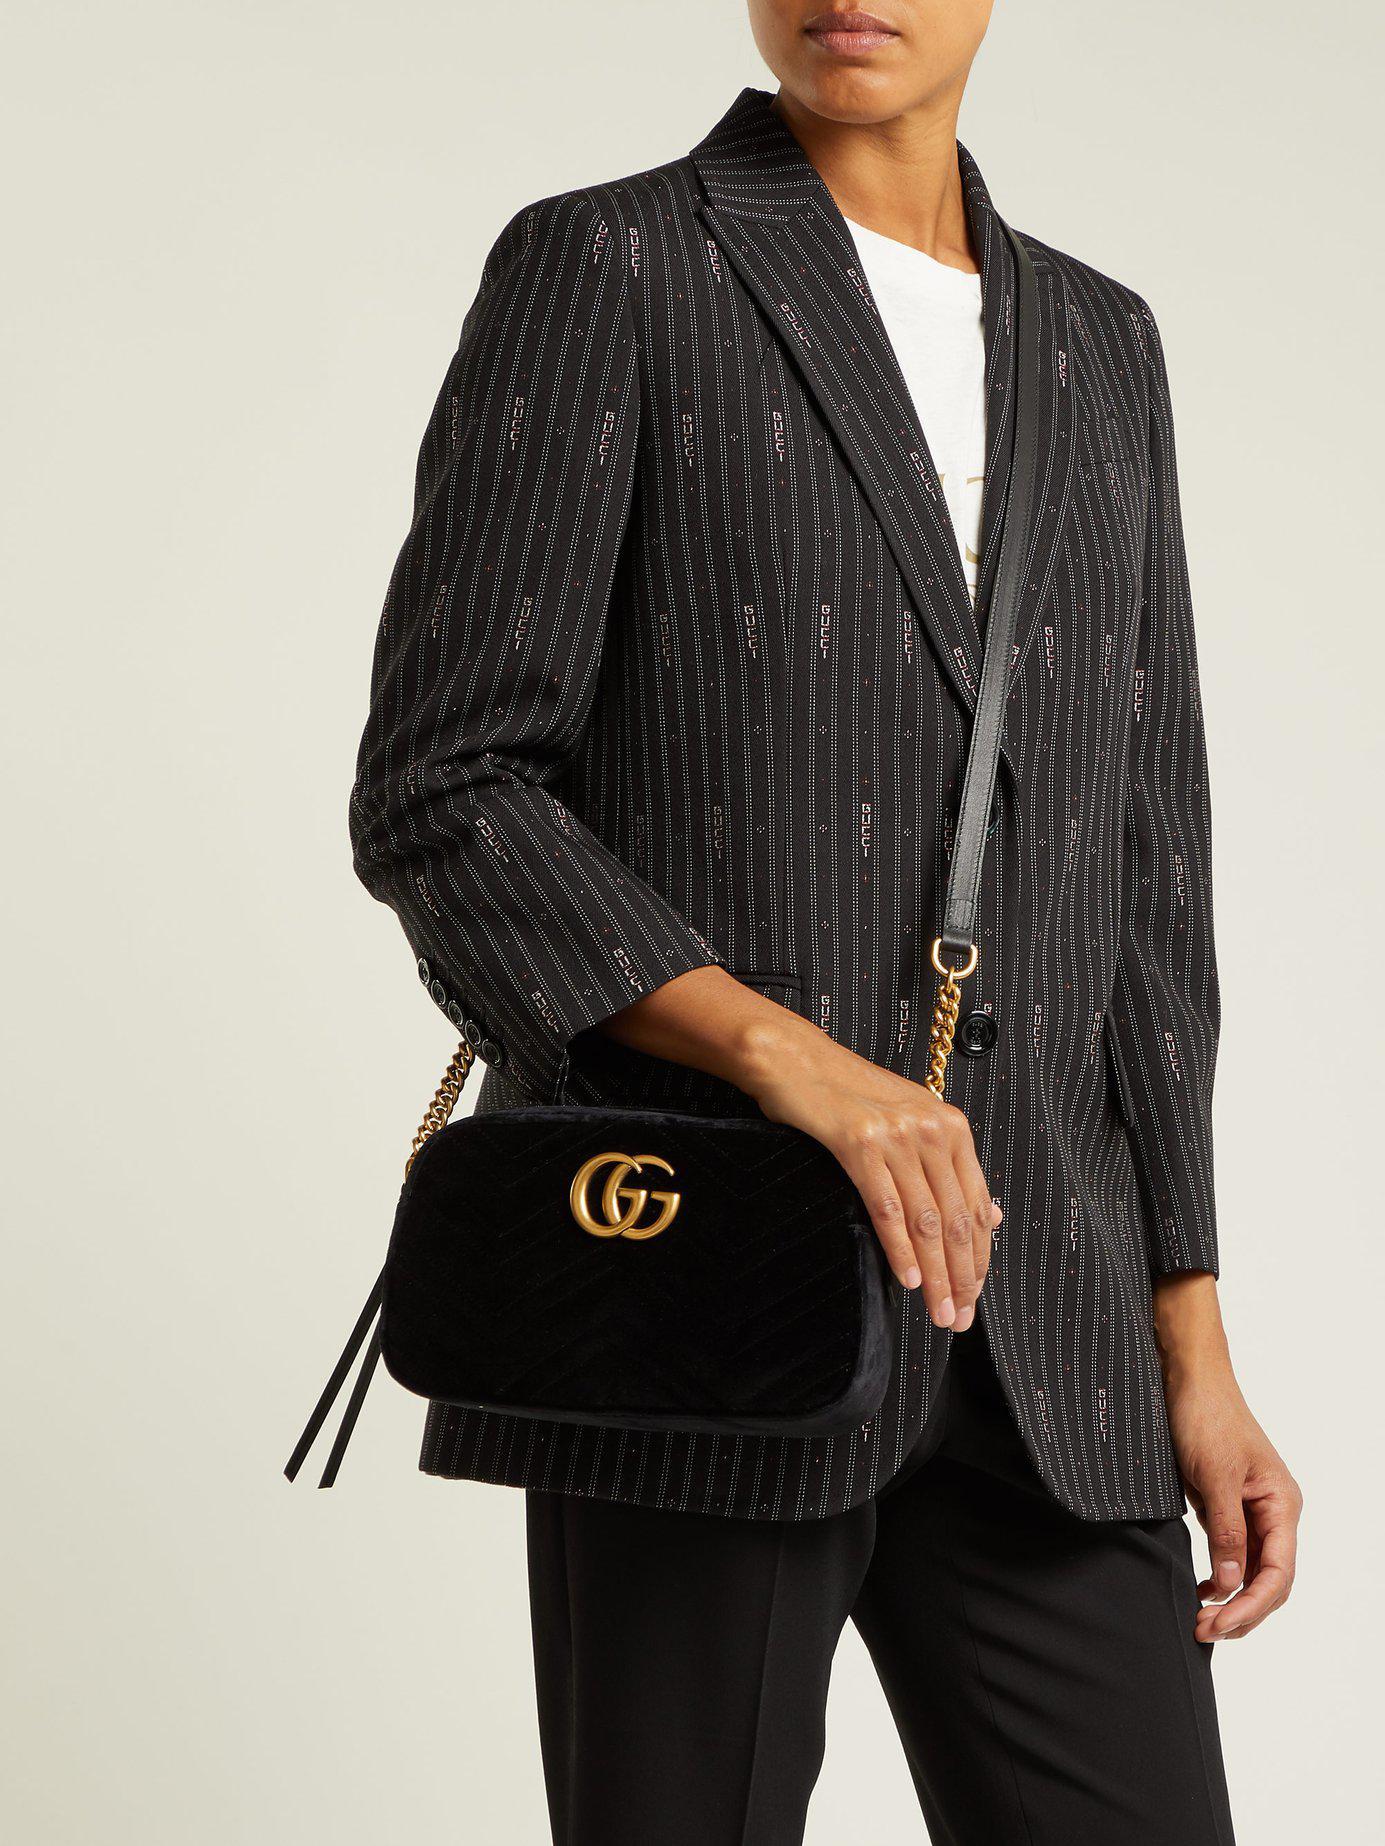 9c6d356f56a185 Gucci - Black GG Marmont Velvet Small Shoulder Bag - Lyst. View fullscreen